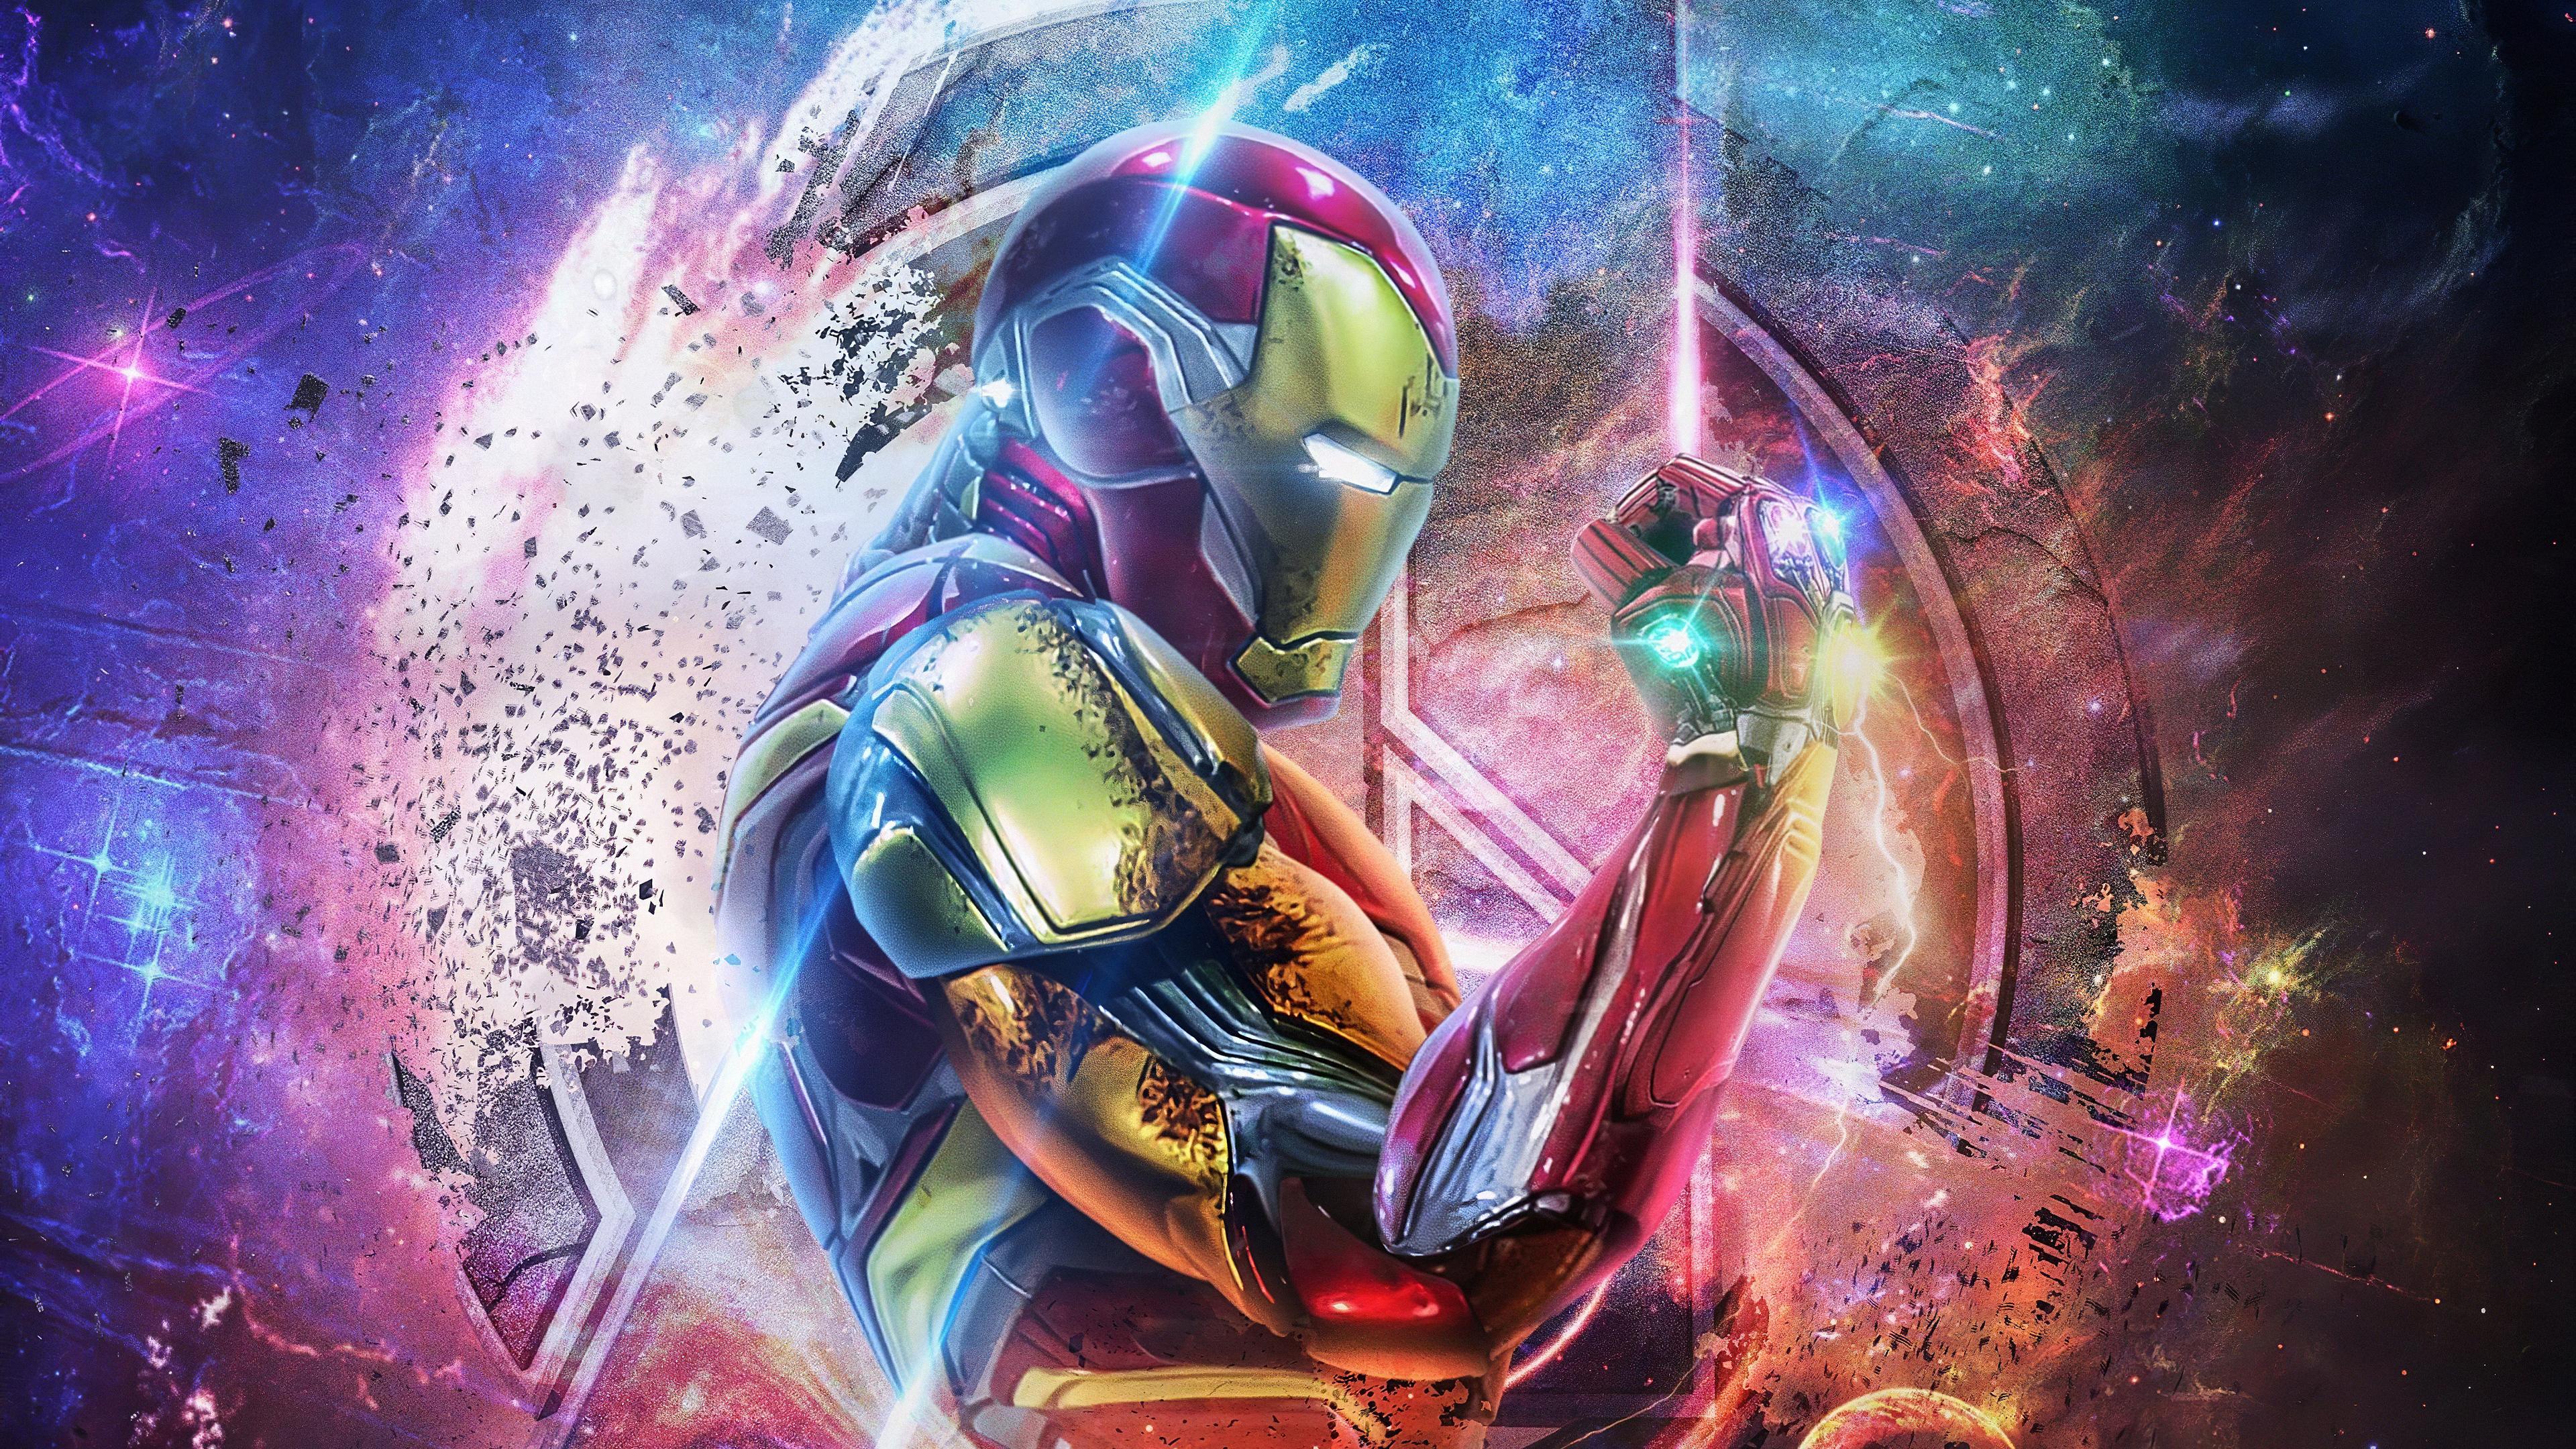 iron man wallpaper,cg artwork,fictional character,graphic design,space,illustration